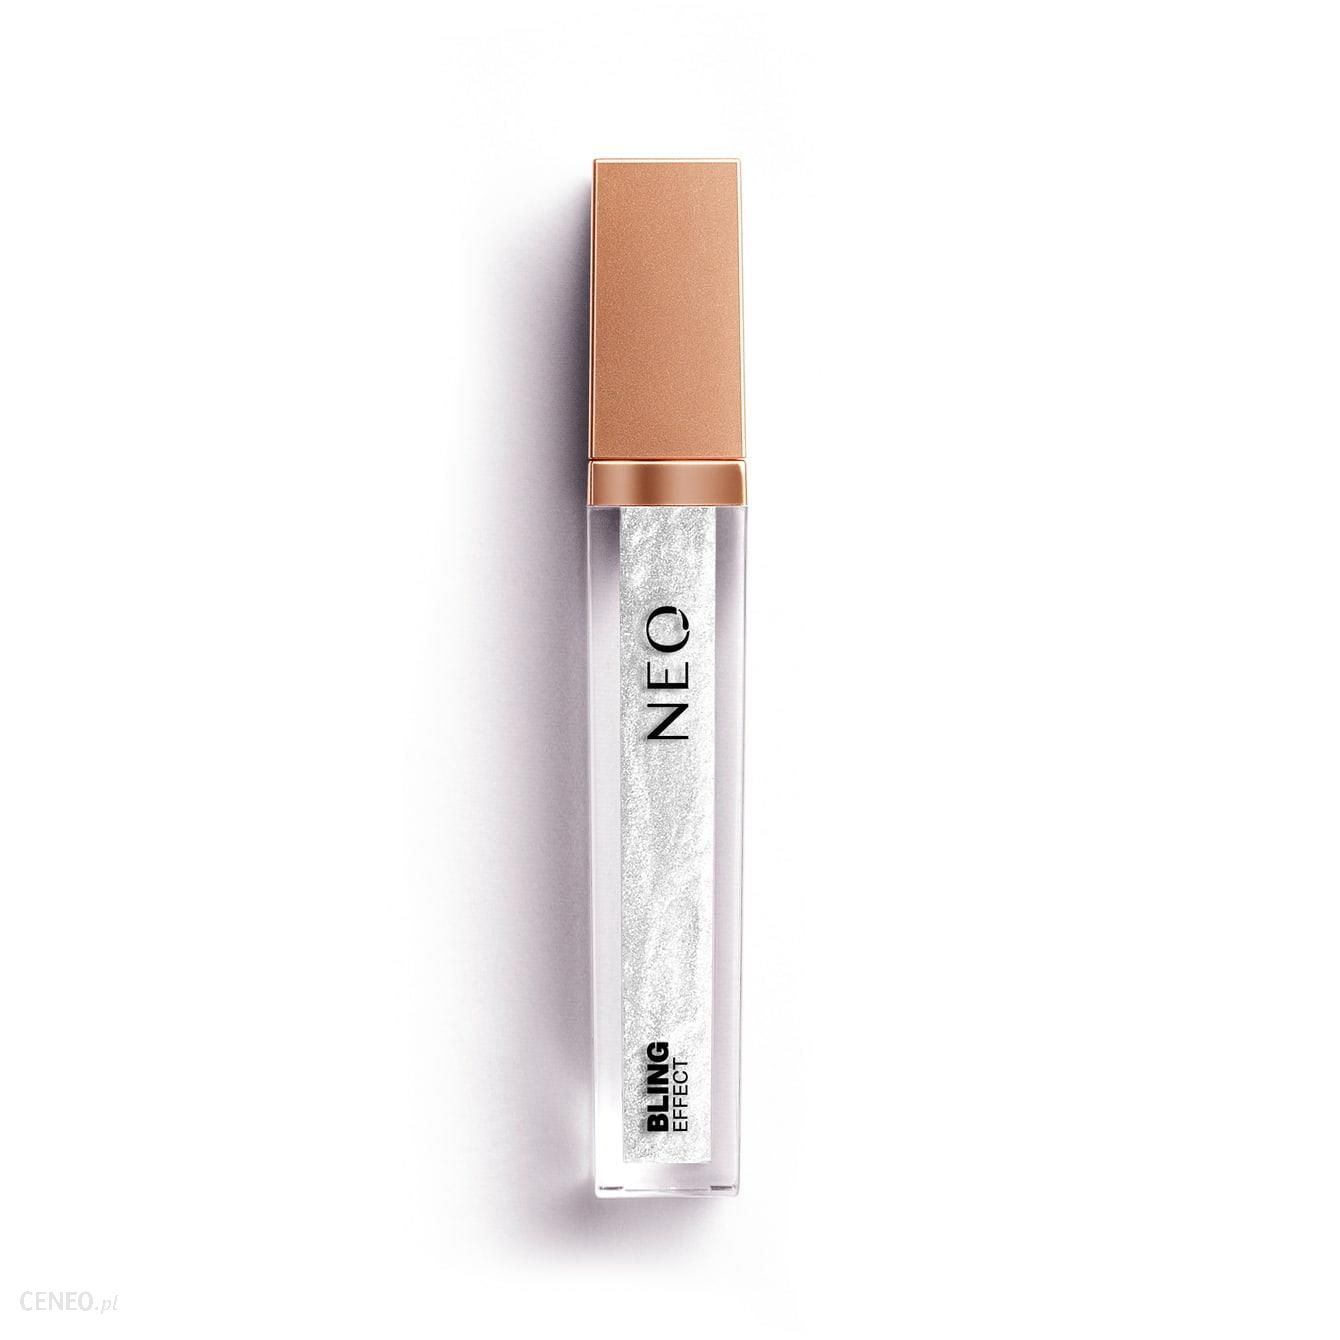 Neo Make Up Błyszczyk Do Ust Blink Effect Lipgloss 31 Coconut